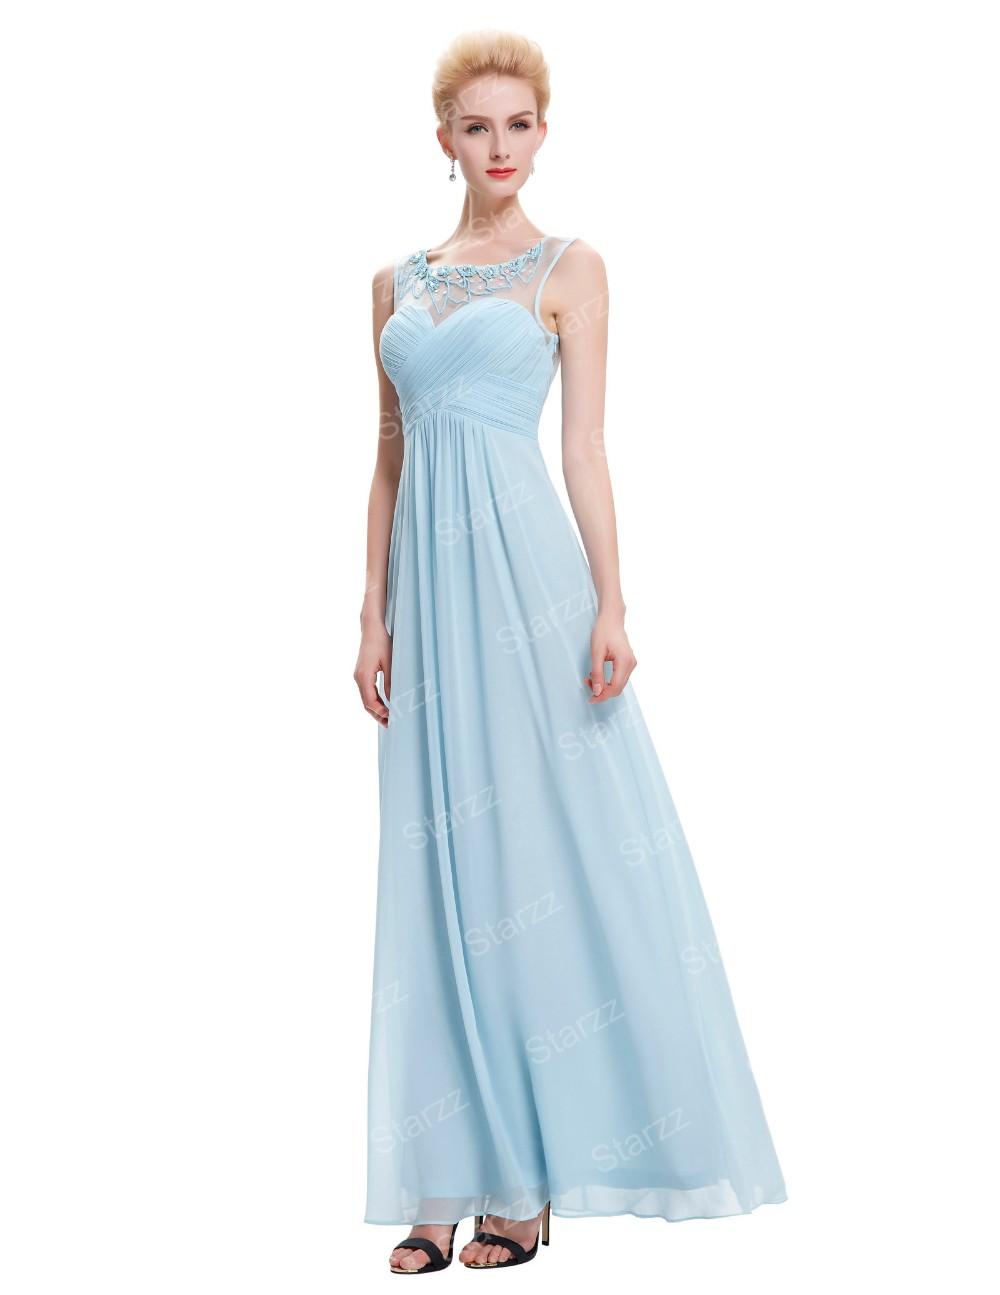 Fancy Debut Bridesmaid Dresses Component - All Wedding Dresses ...